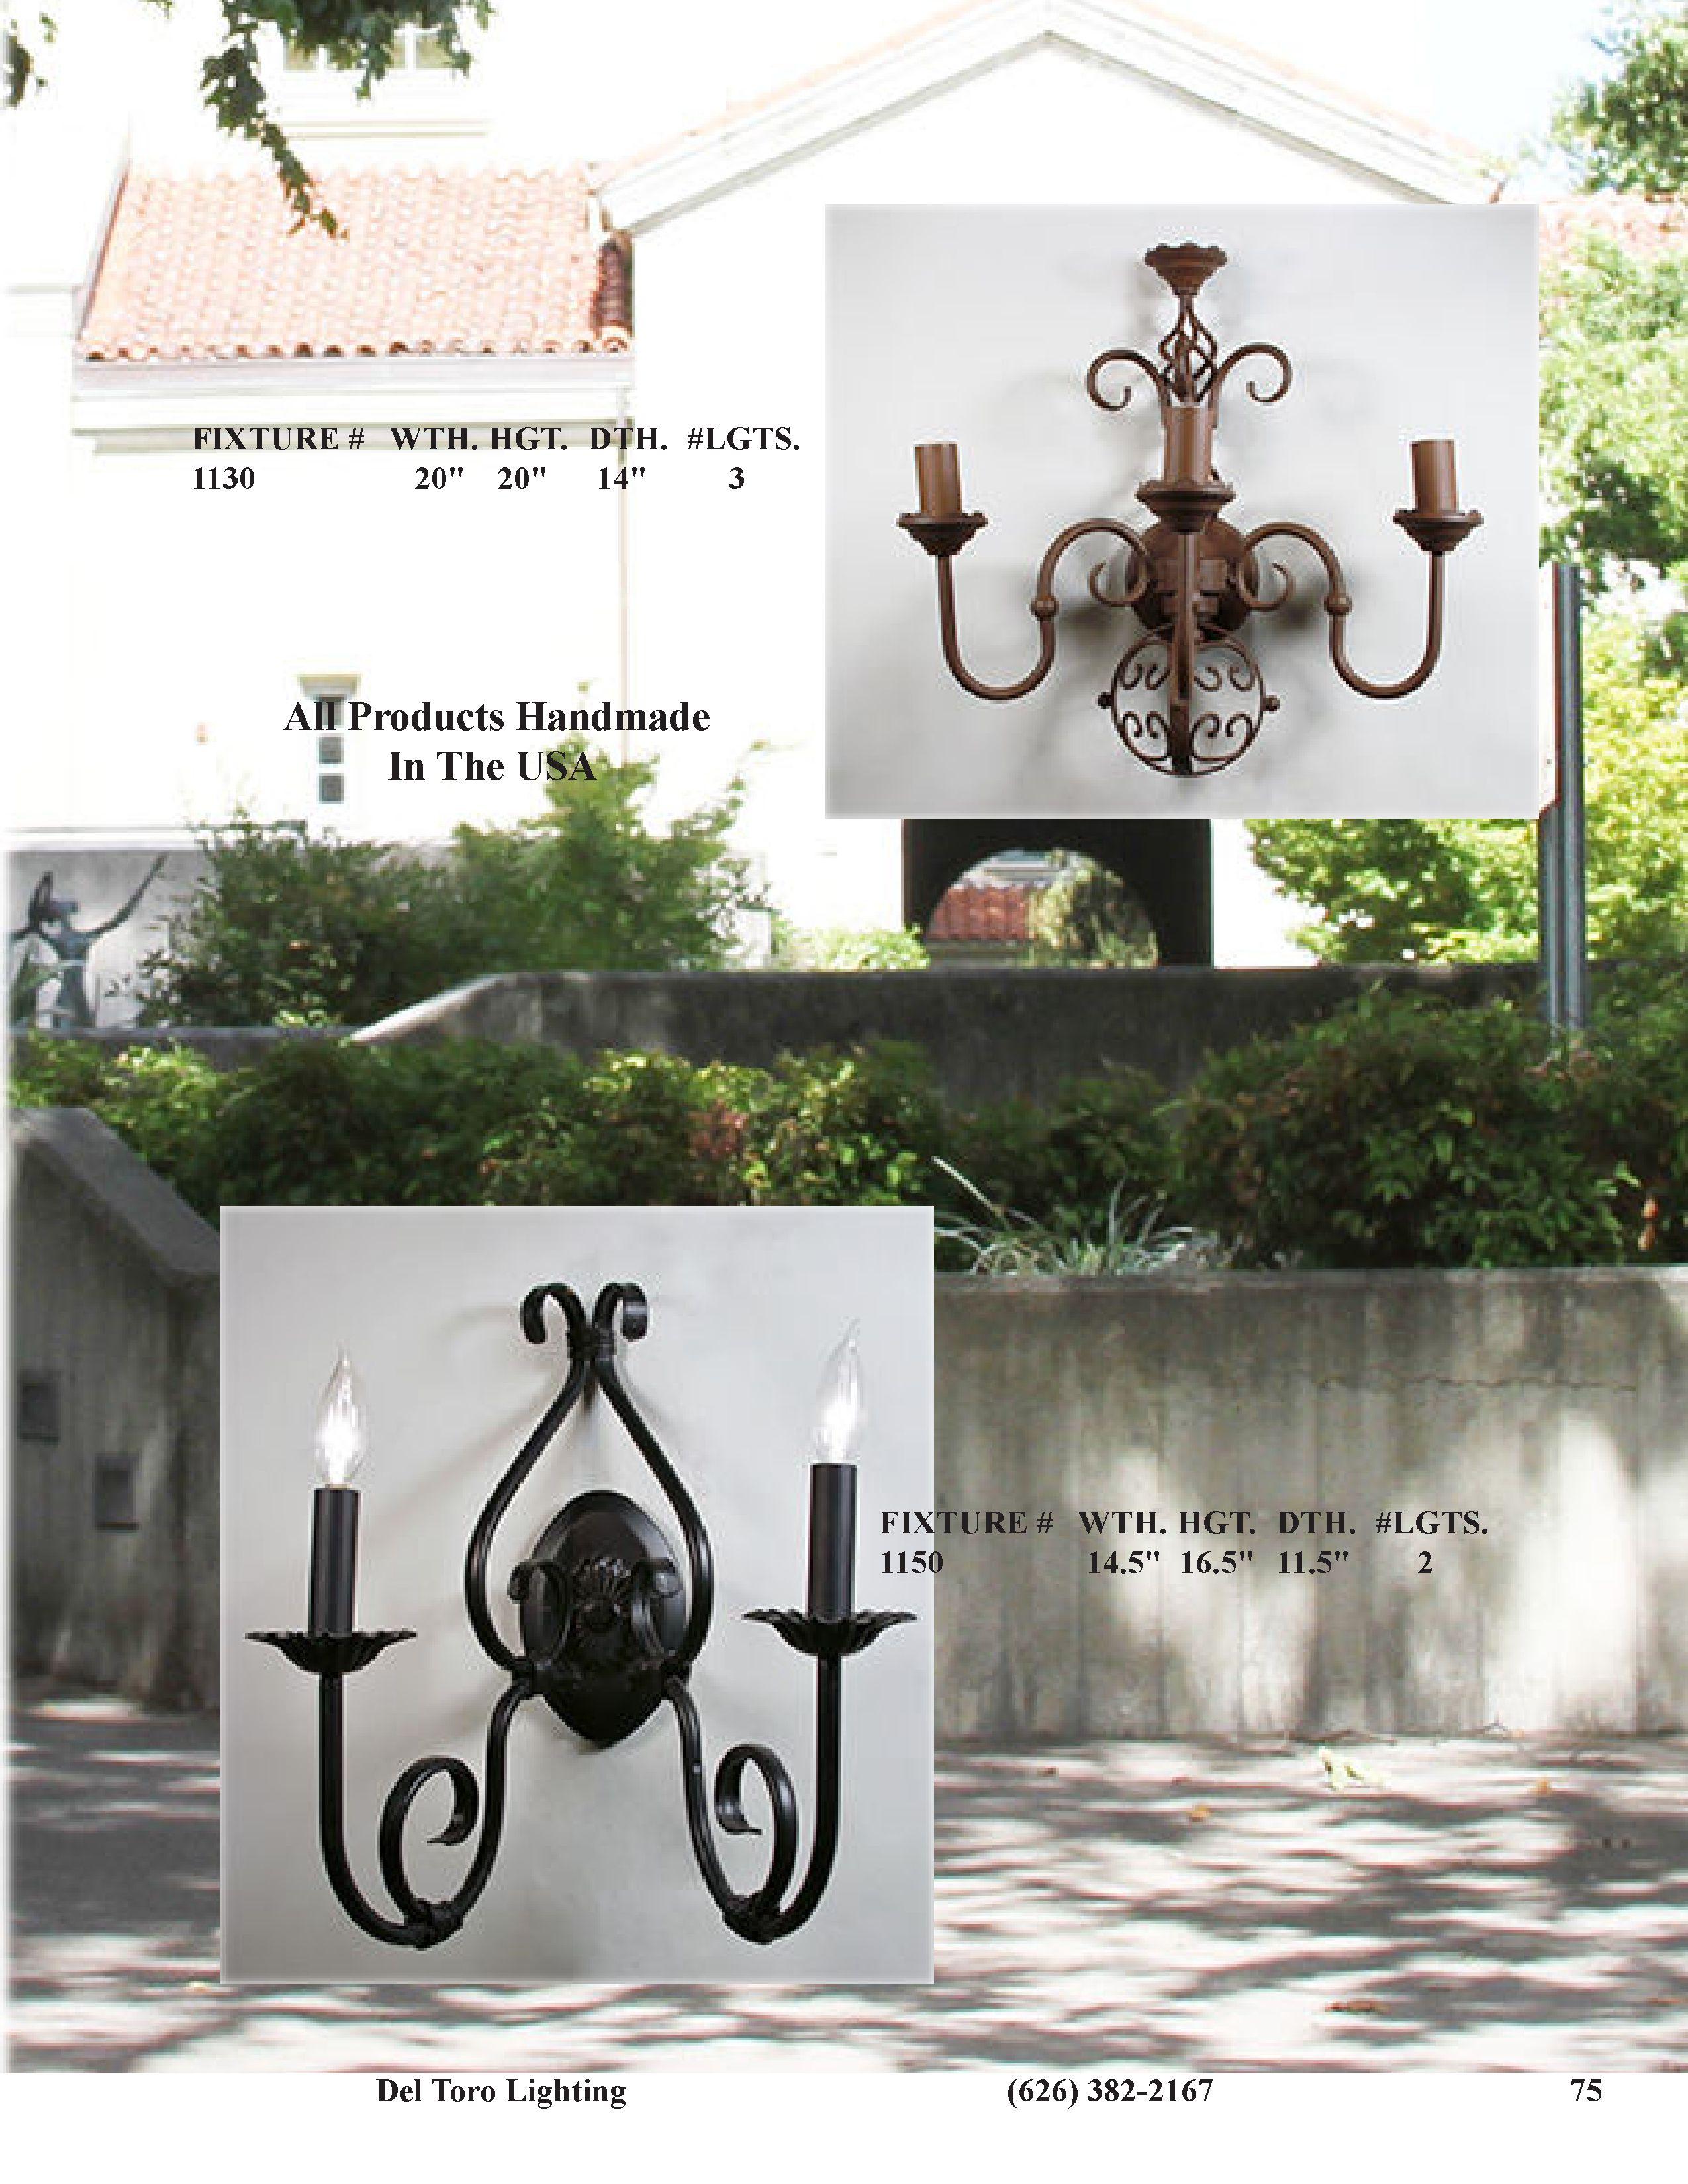 https://0201.nccdn.net/4_2/000/000/001/430/Del-Toro-2013-Catalog_75.jpg